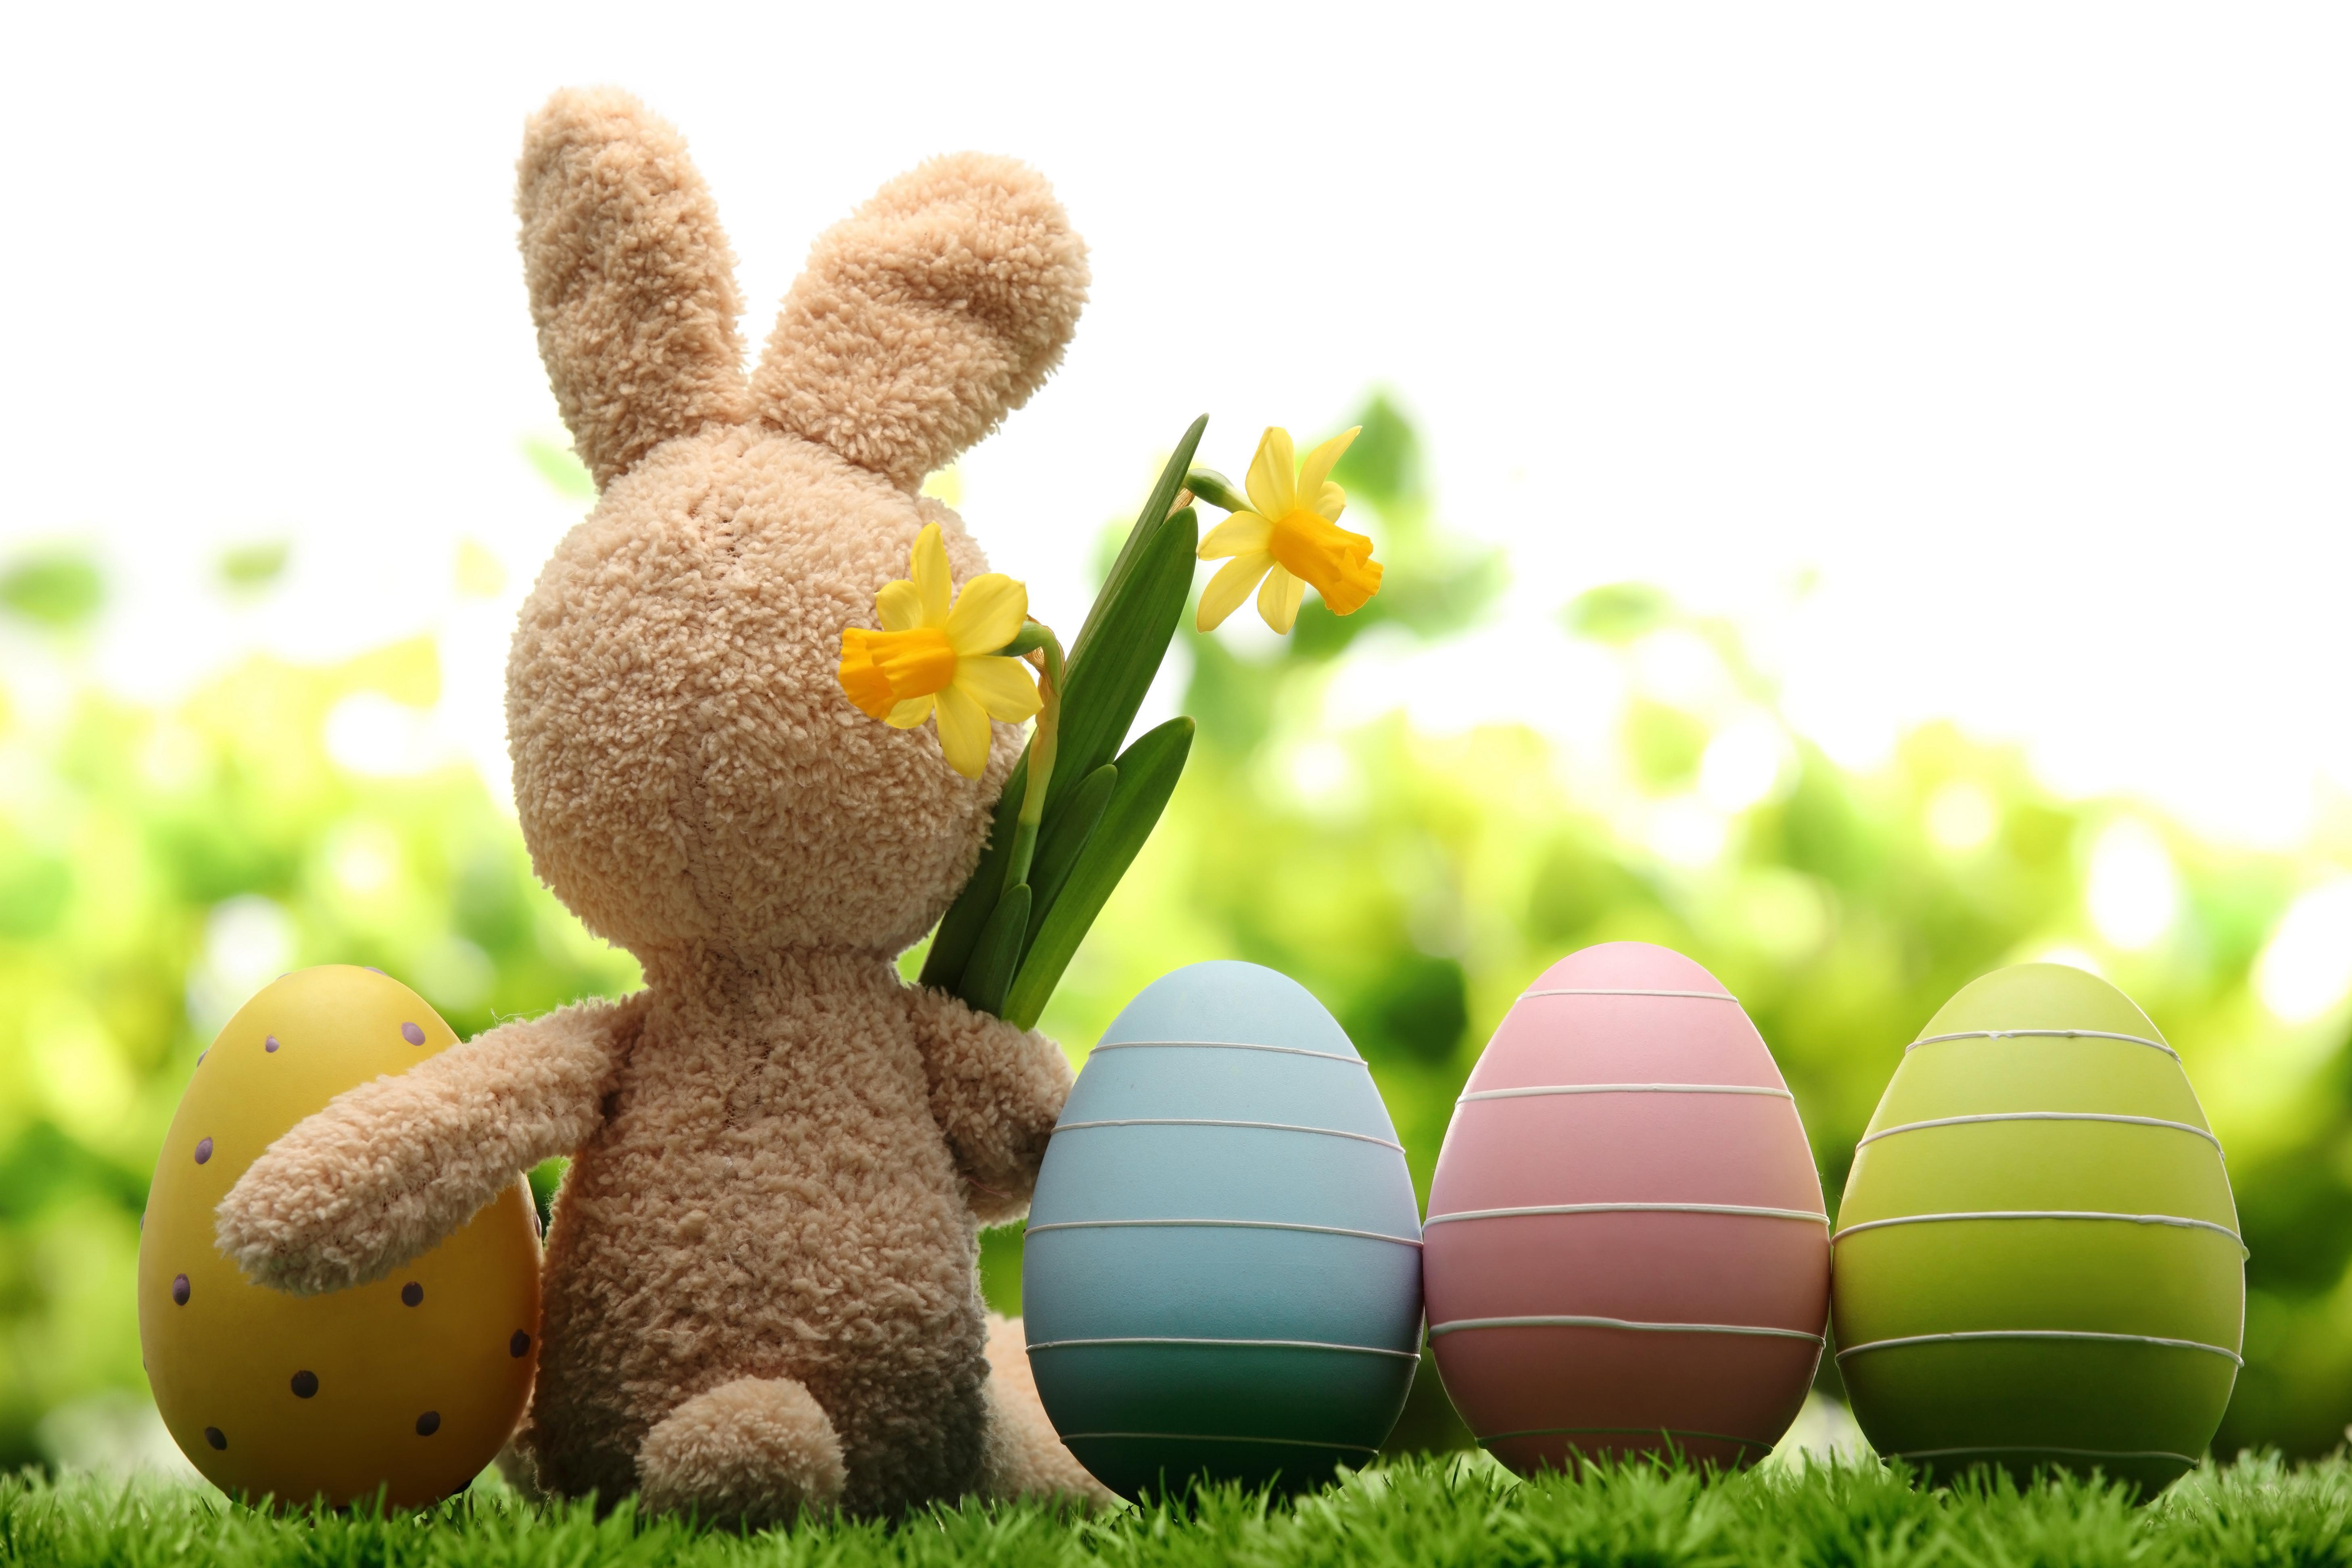 35 Happy Easter Desktop Wallpaper HD for 5830x3887